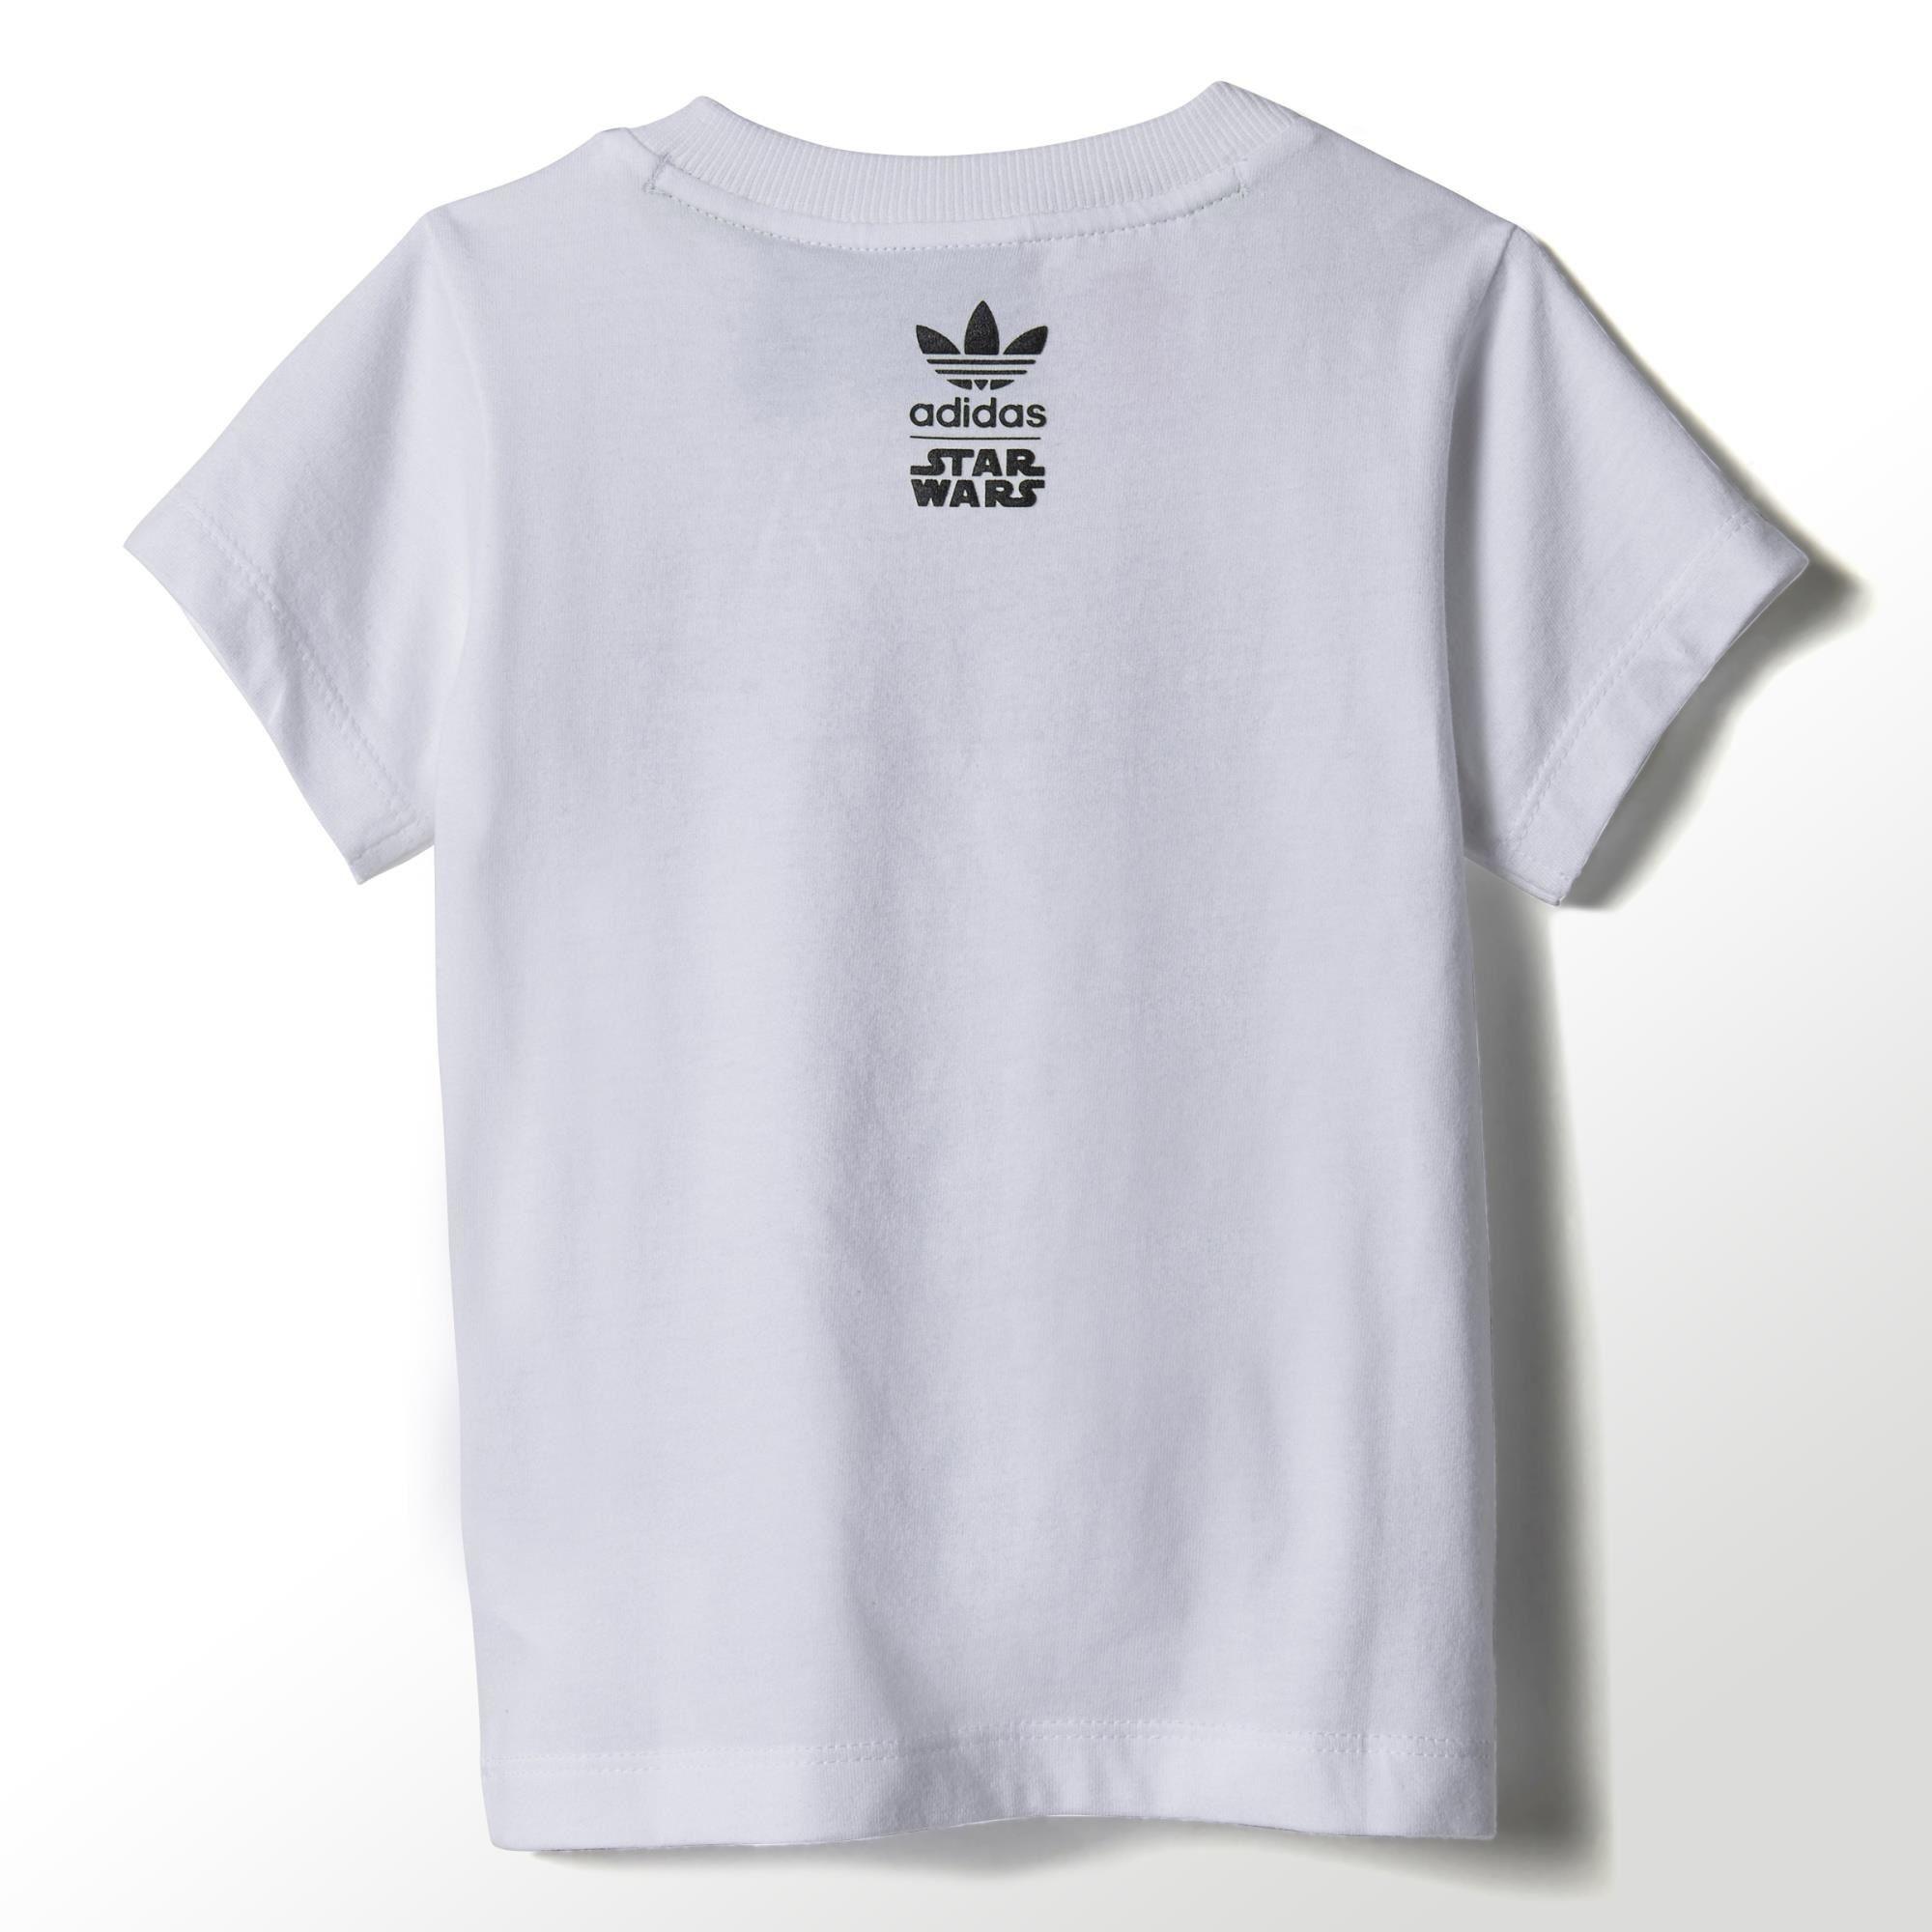 Adidas Originals Camiseta Infantil Star Wars Master Yoda (blanco